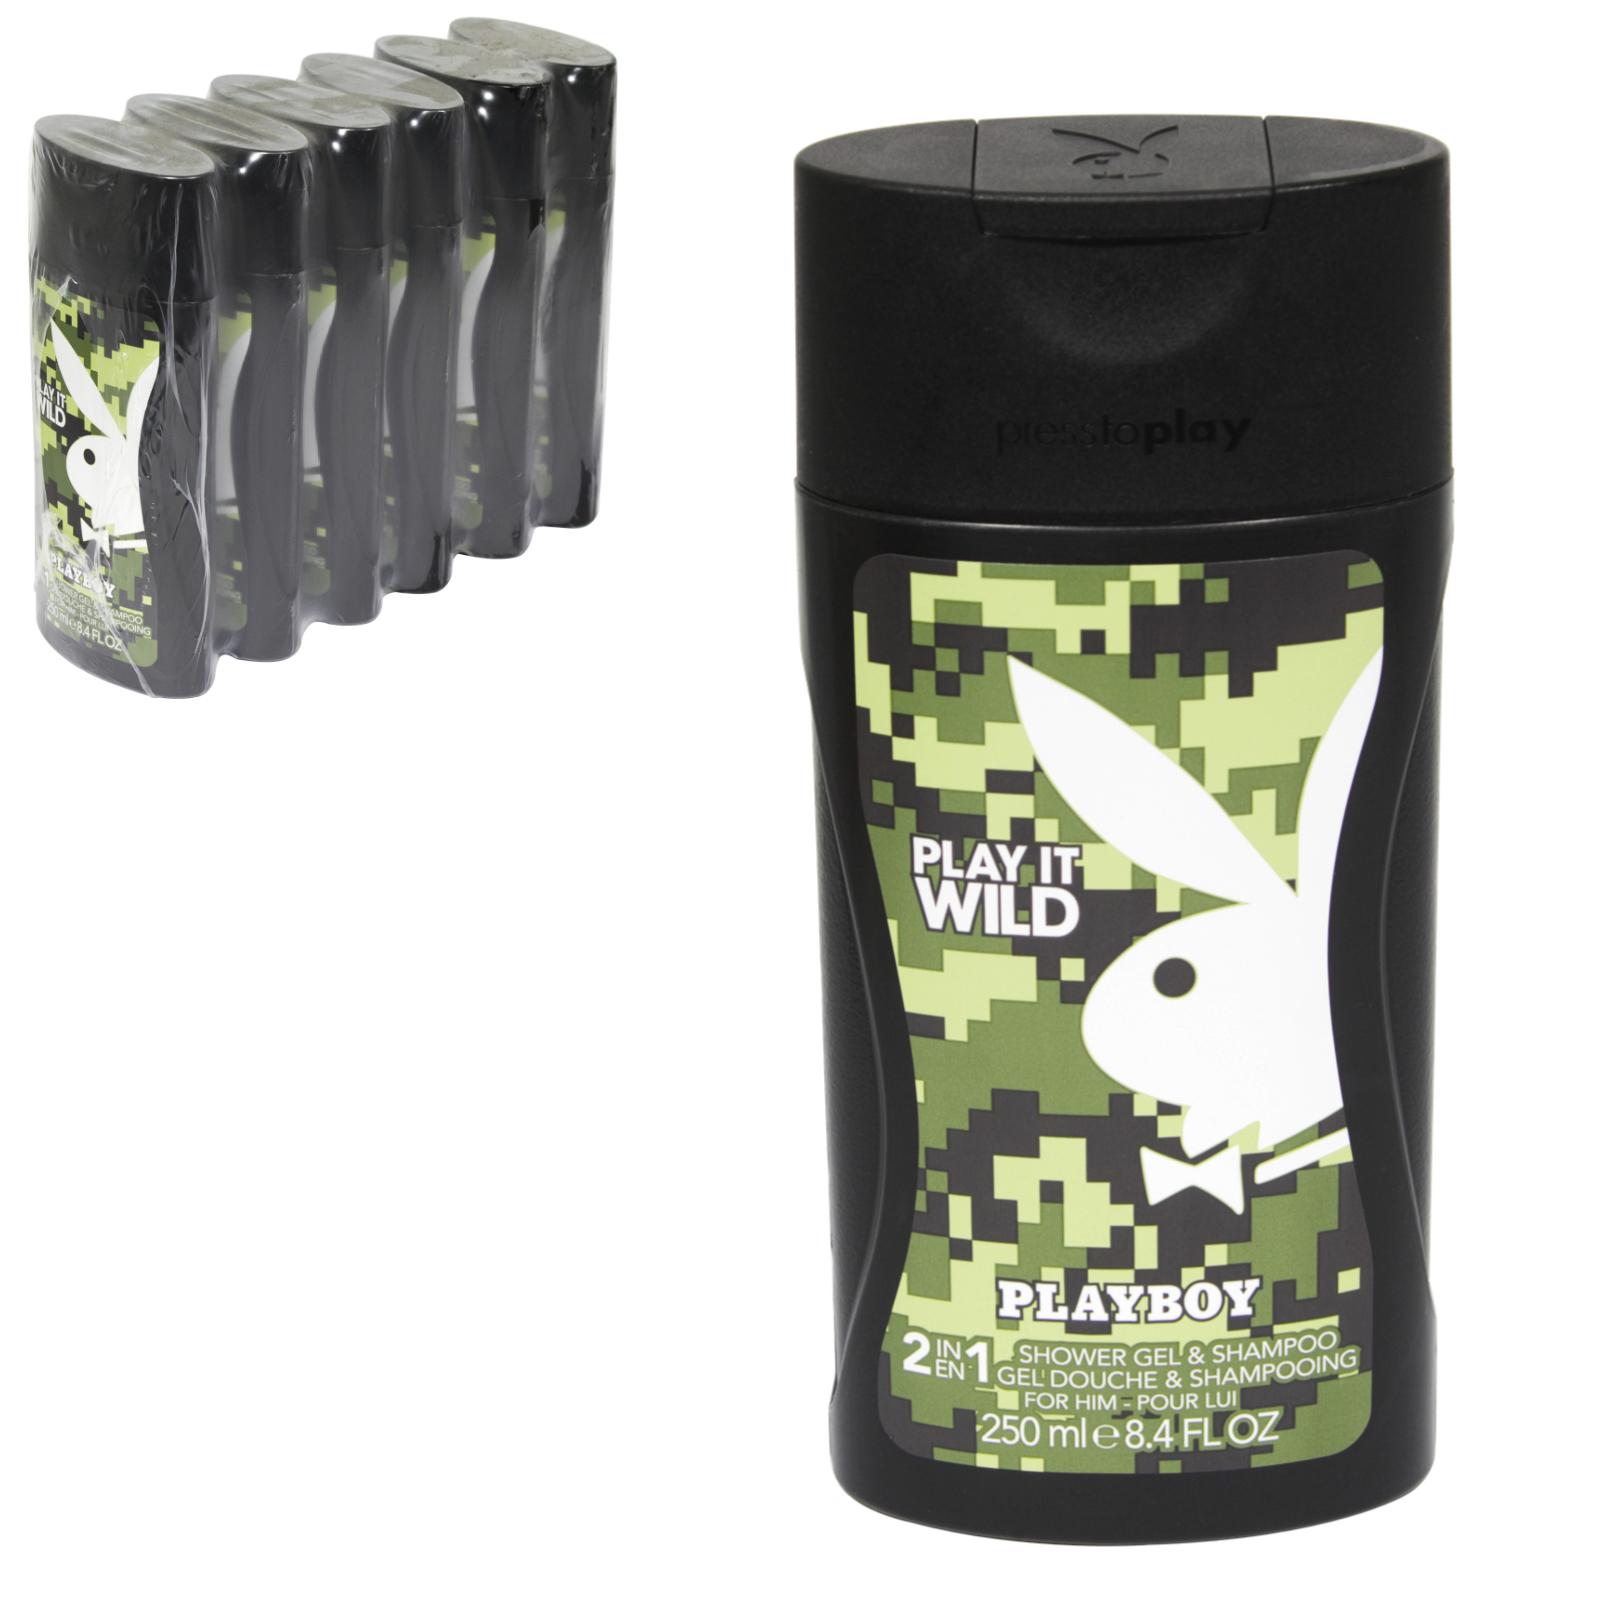 PLAYBOY FEMALE SHOWER GEL 250ML PLAY IT WILD X6